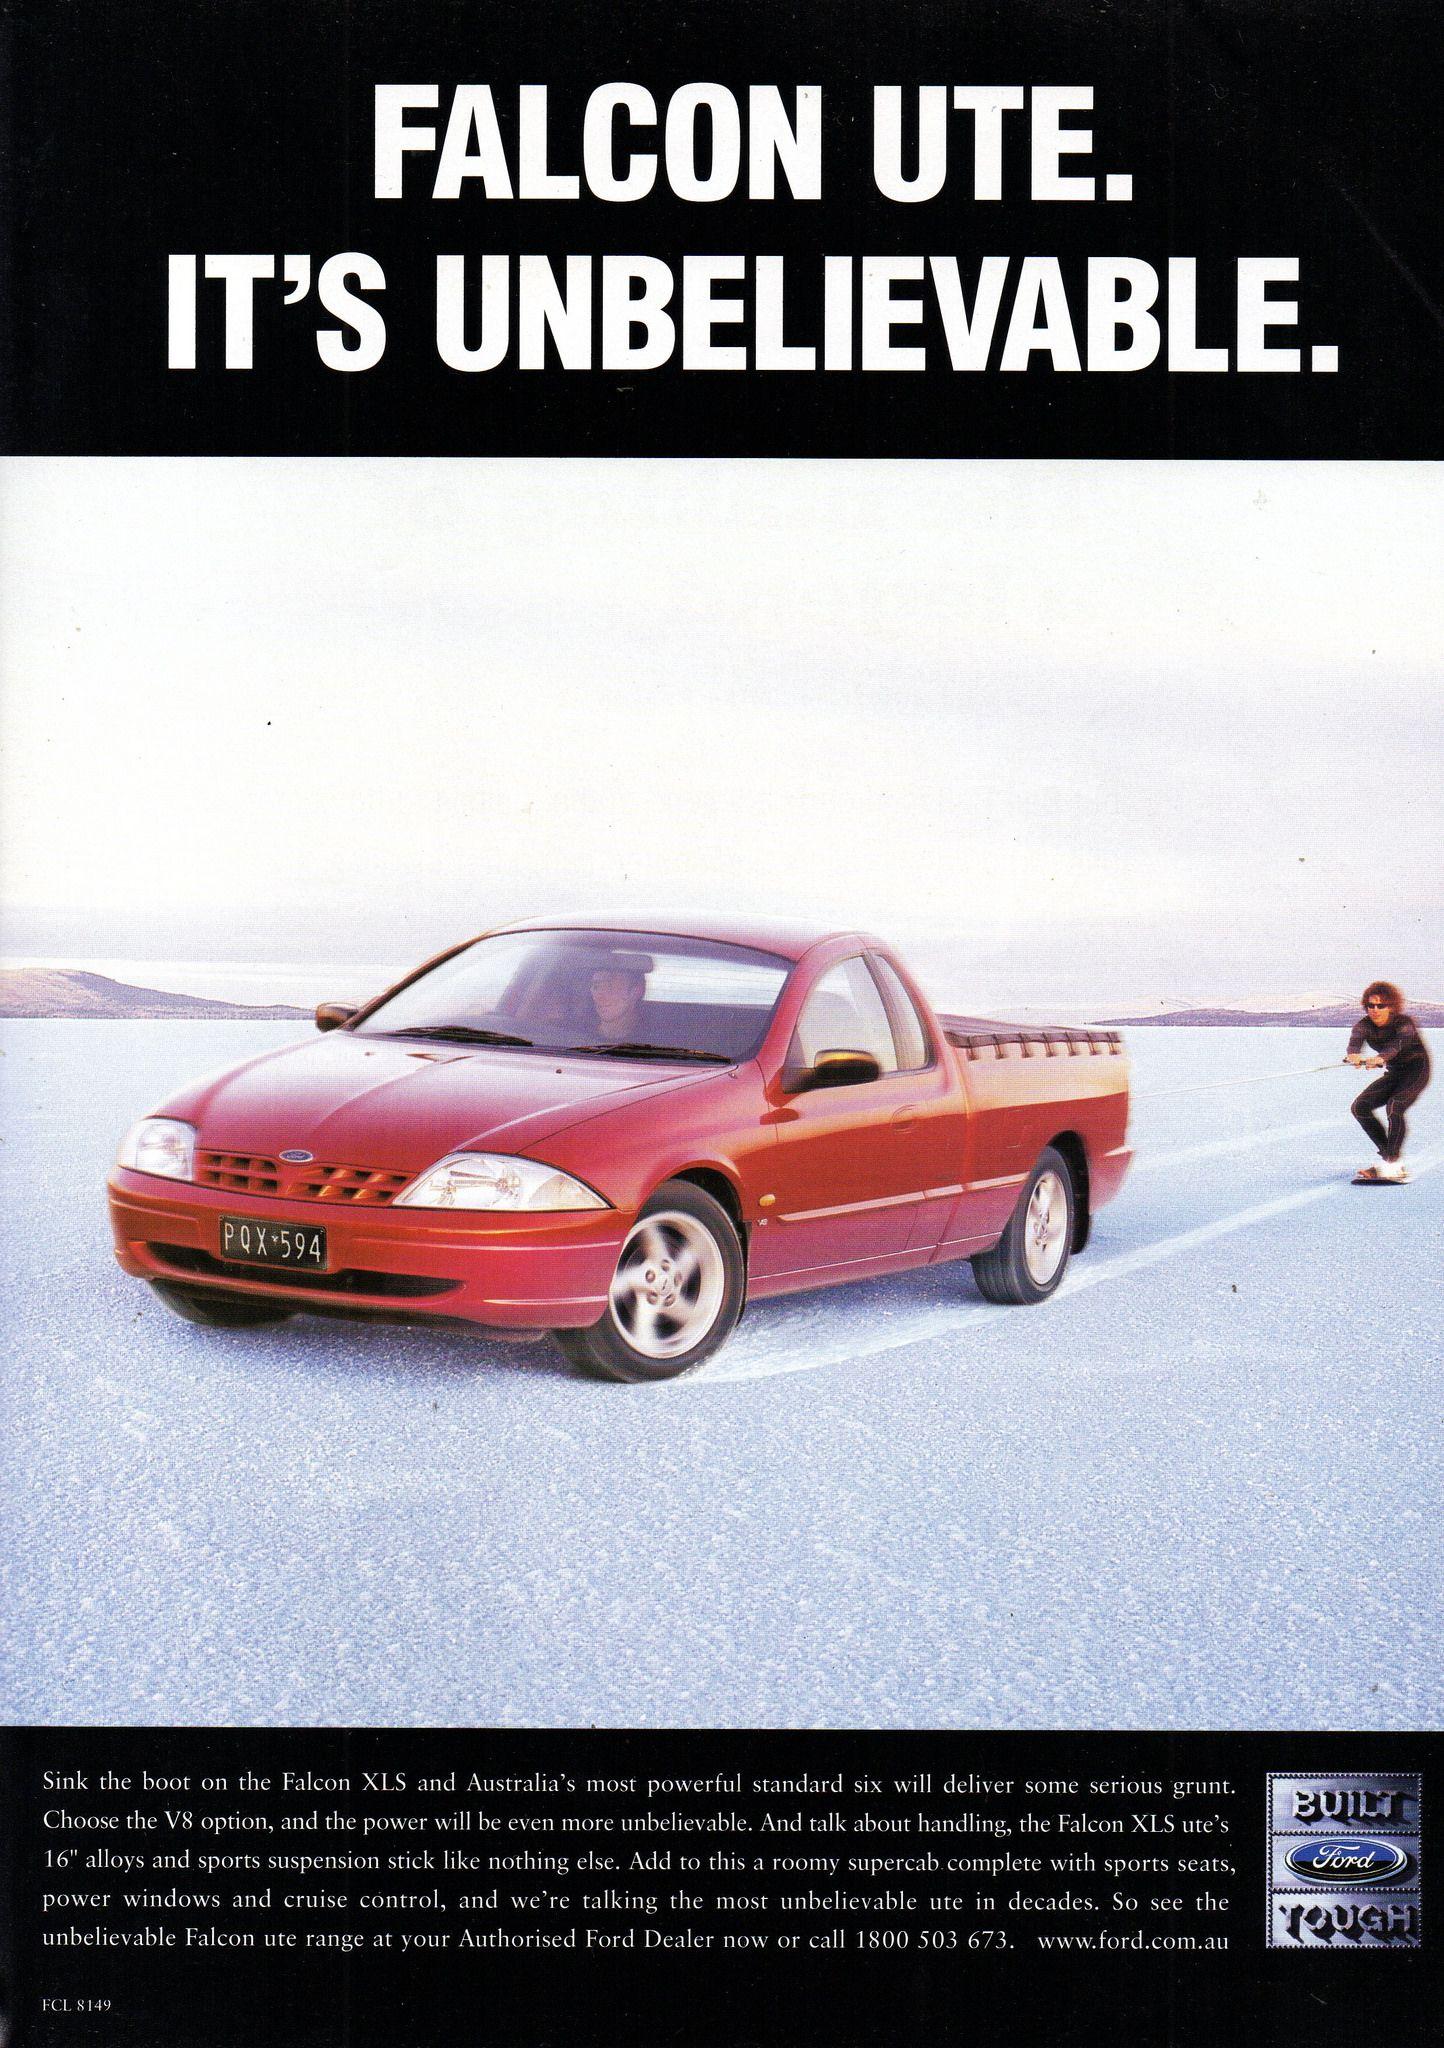 2000 Au Ford Falcon Xls 6 Or V8 Utility Ute Aussie Original Magazine Advertisement Ford Falcon Australian Cars Car Ford